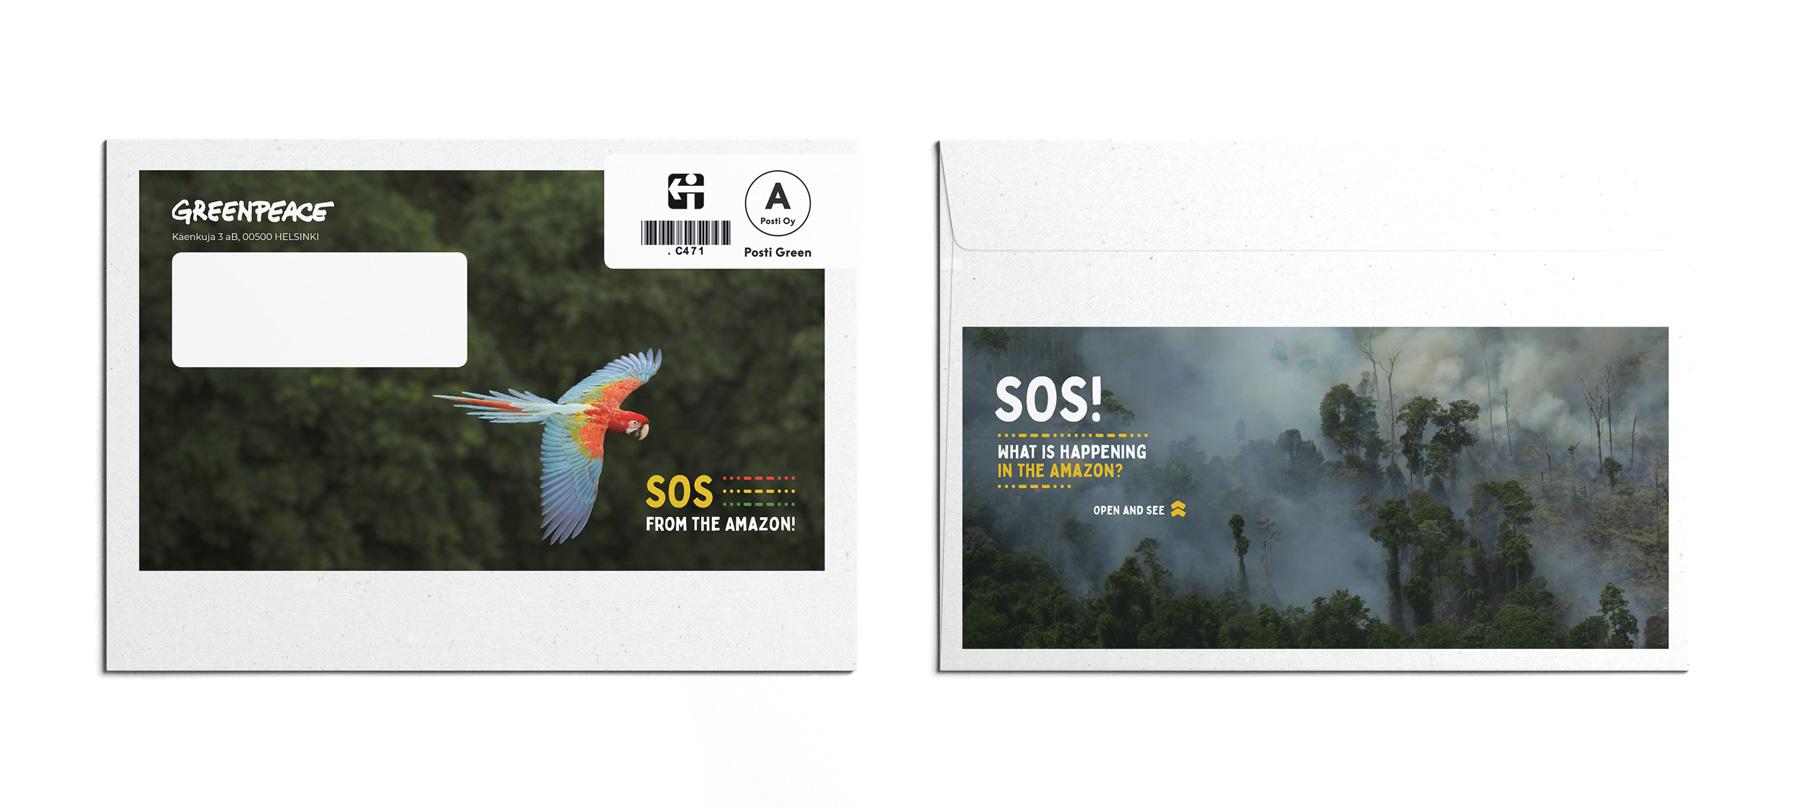 Greenpeace kirjekuori